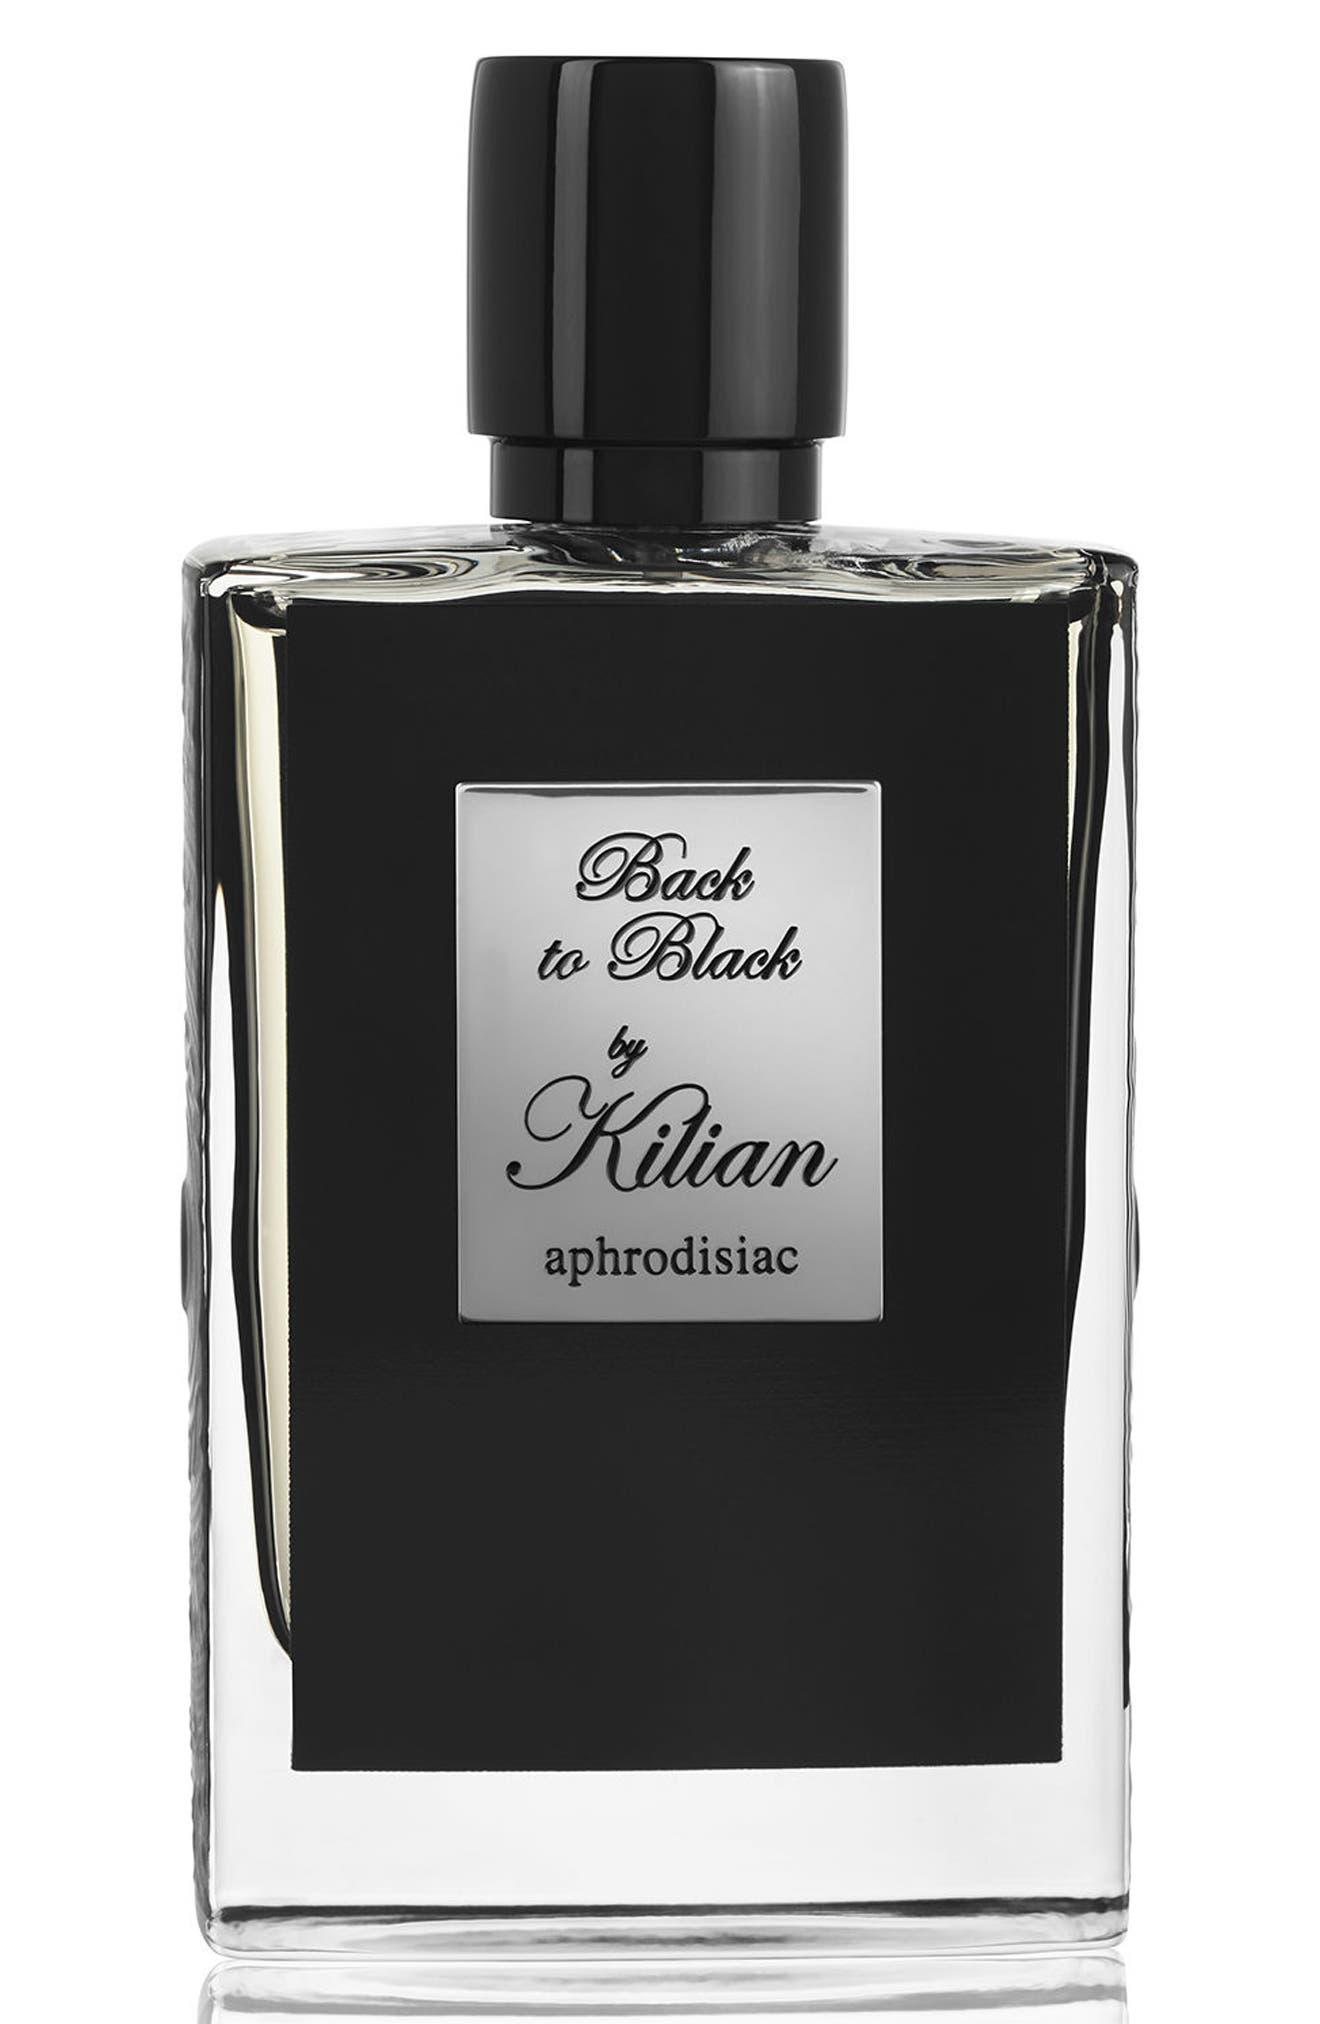 KILIAN, LOeuvre Noire - Back to Black, aphrodisiac Refillable Fragrance Spray, Main thumbnail 1, color, NO COLOR